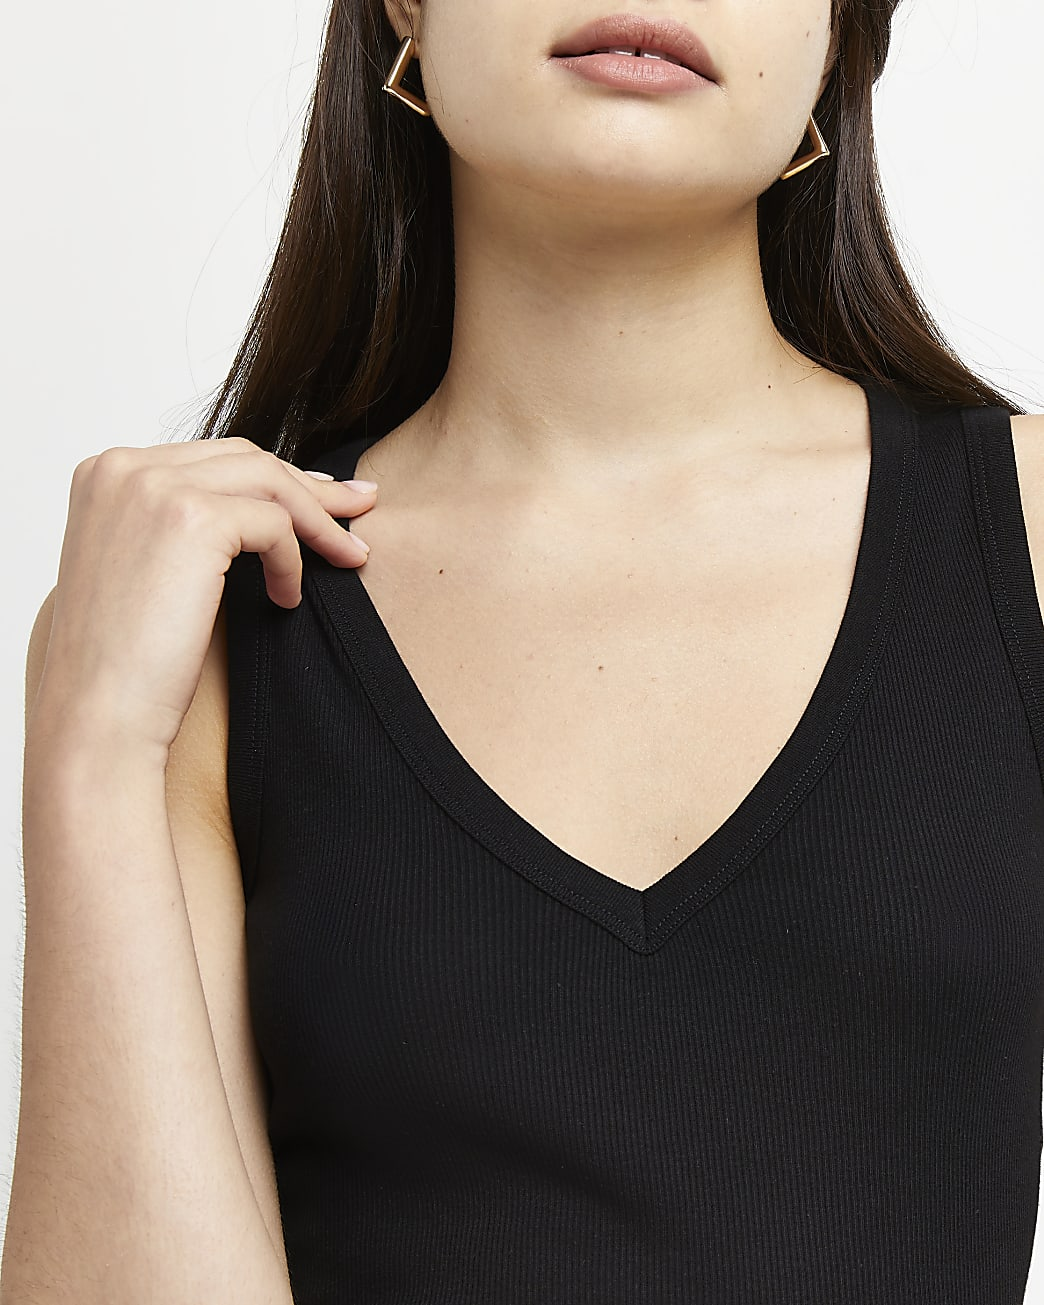 Black v-neck vest top